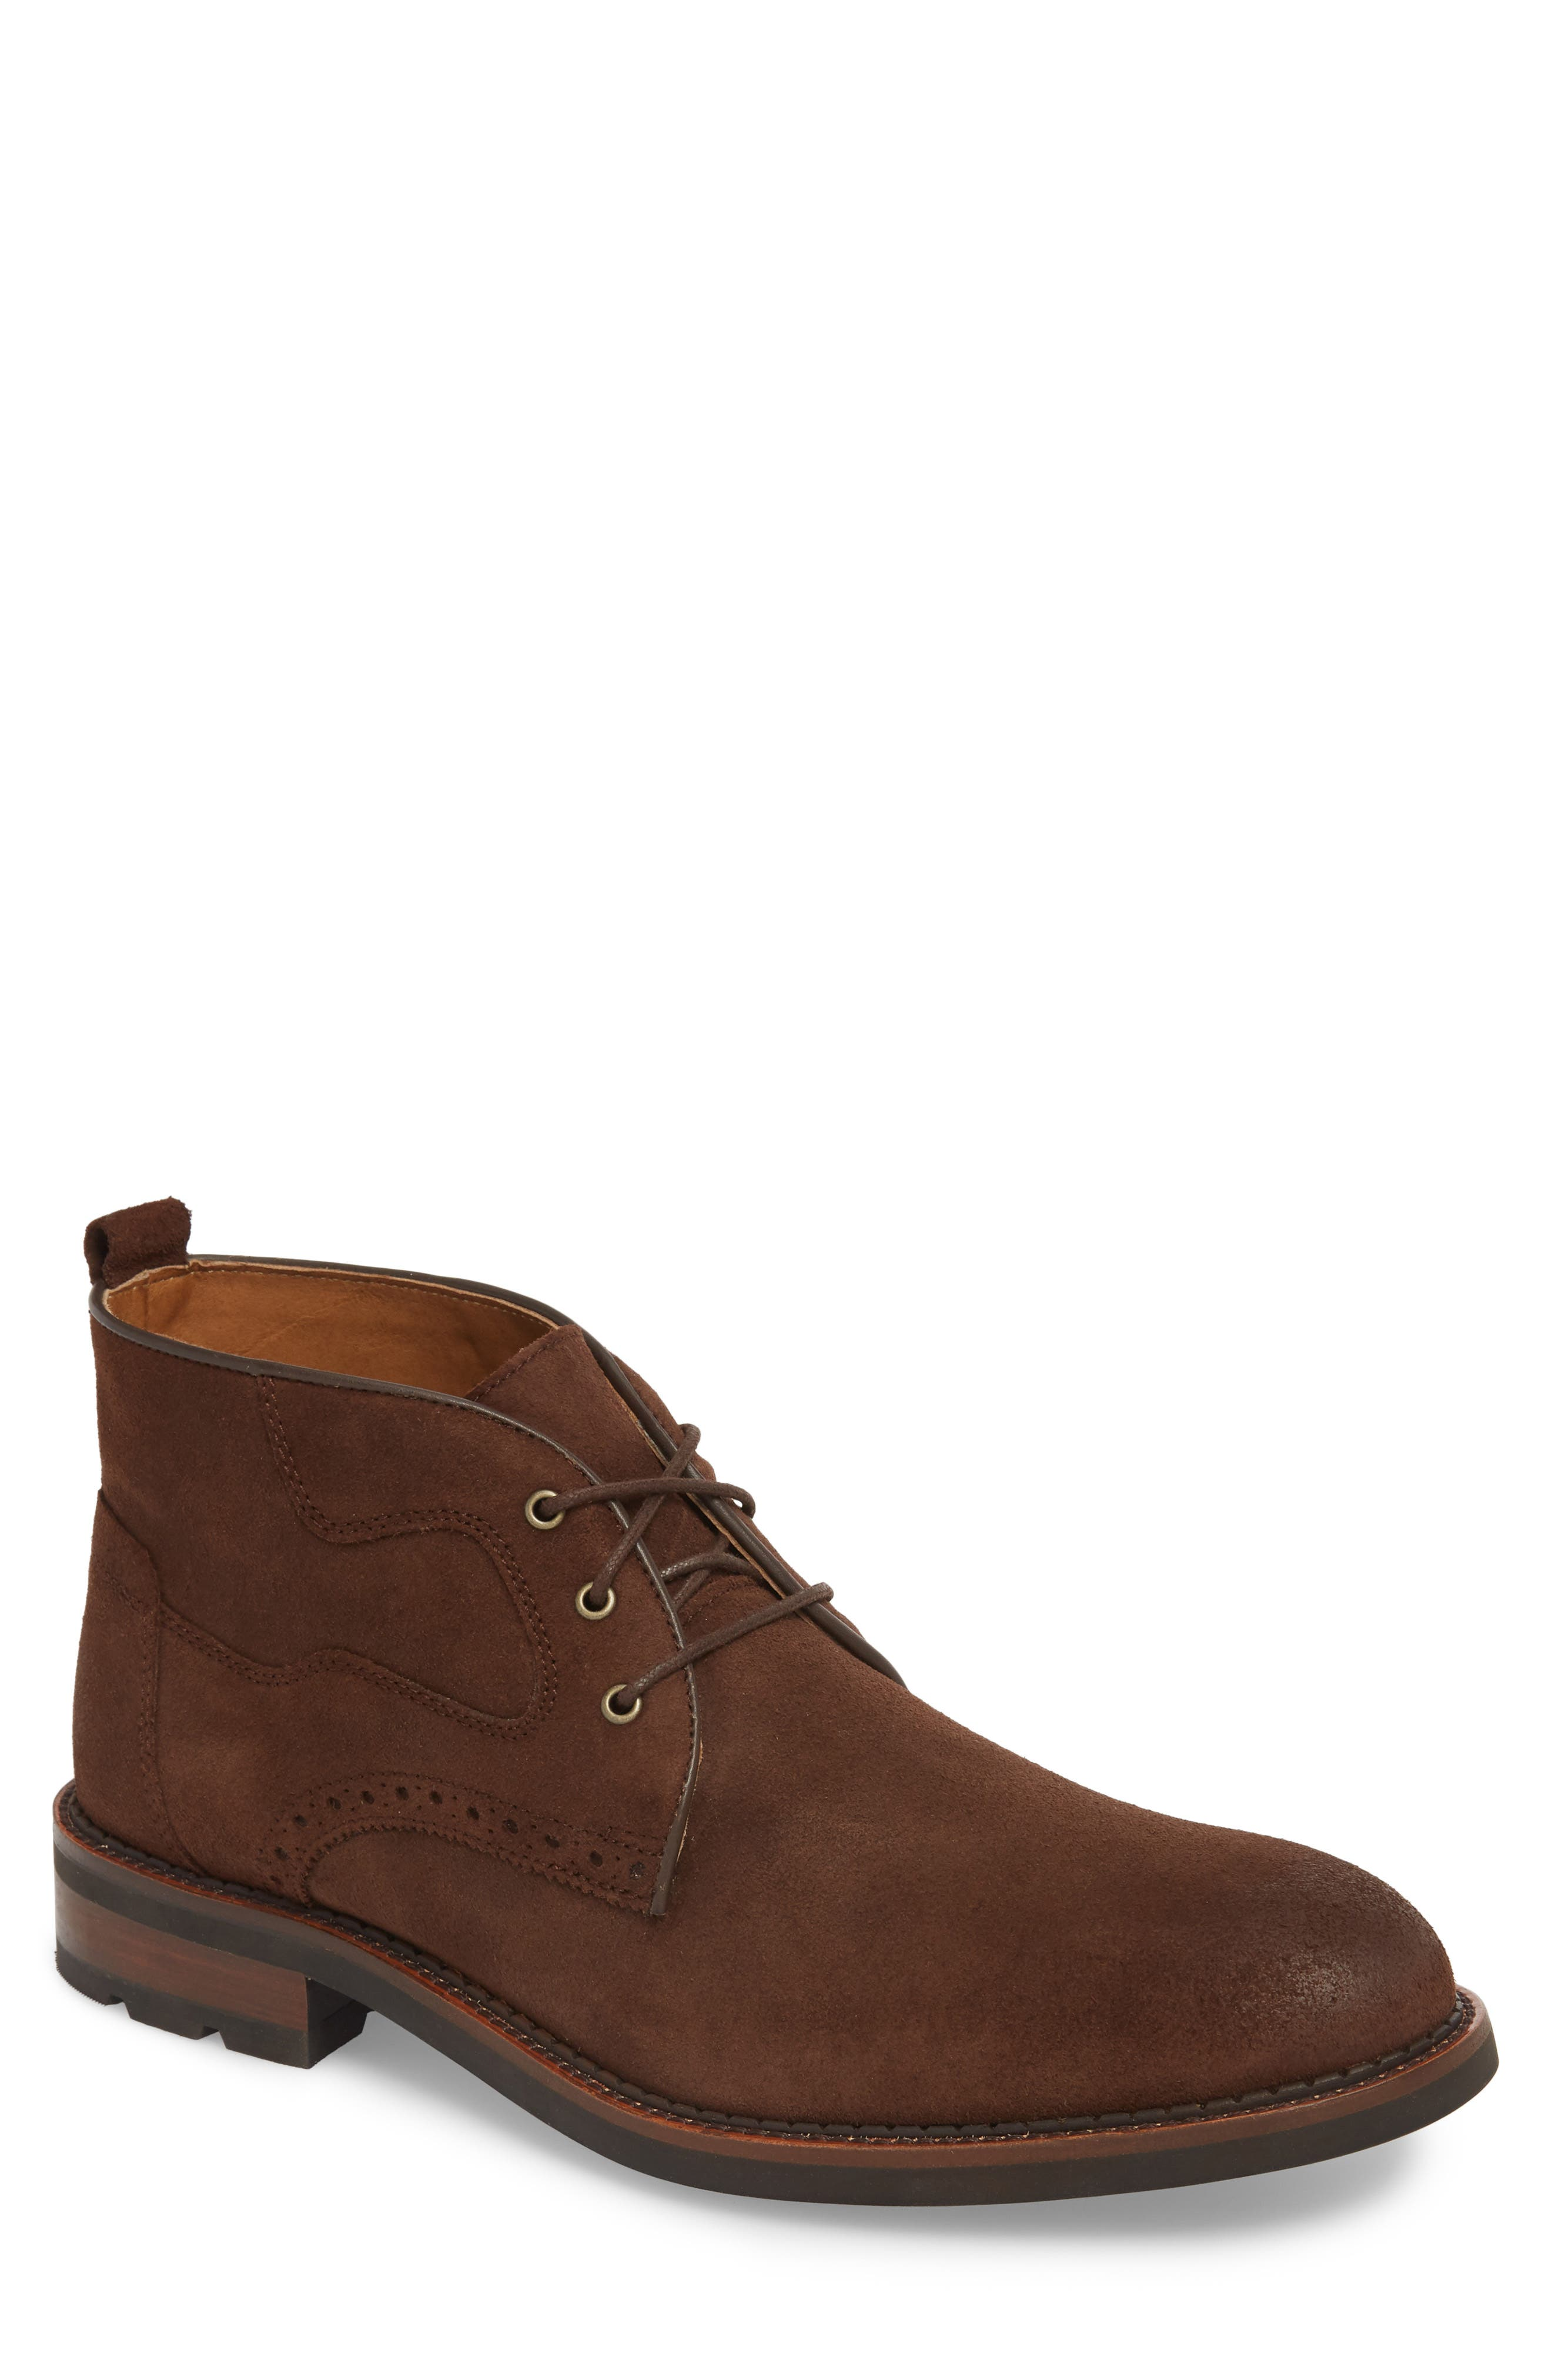 J&M Men's 1850 Fullerton Chukka Boot ES2ZSZmD7